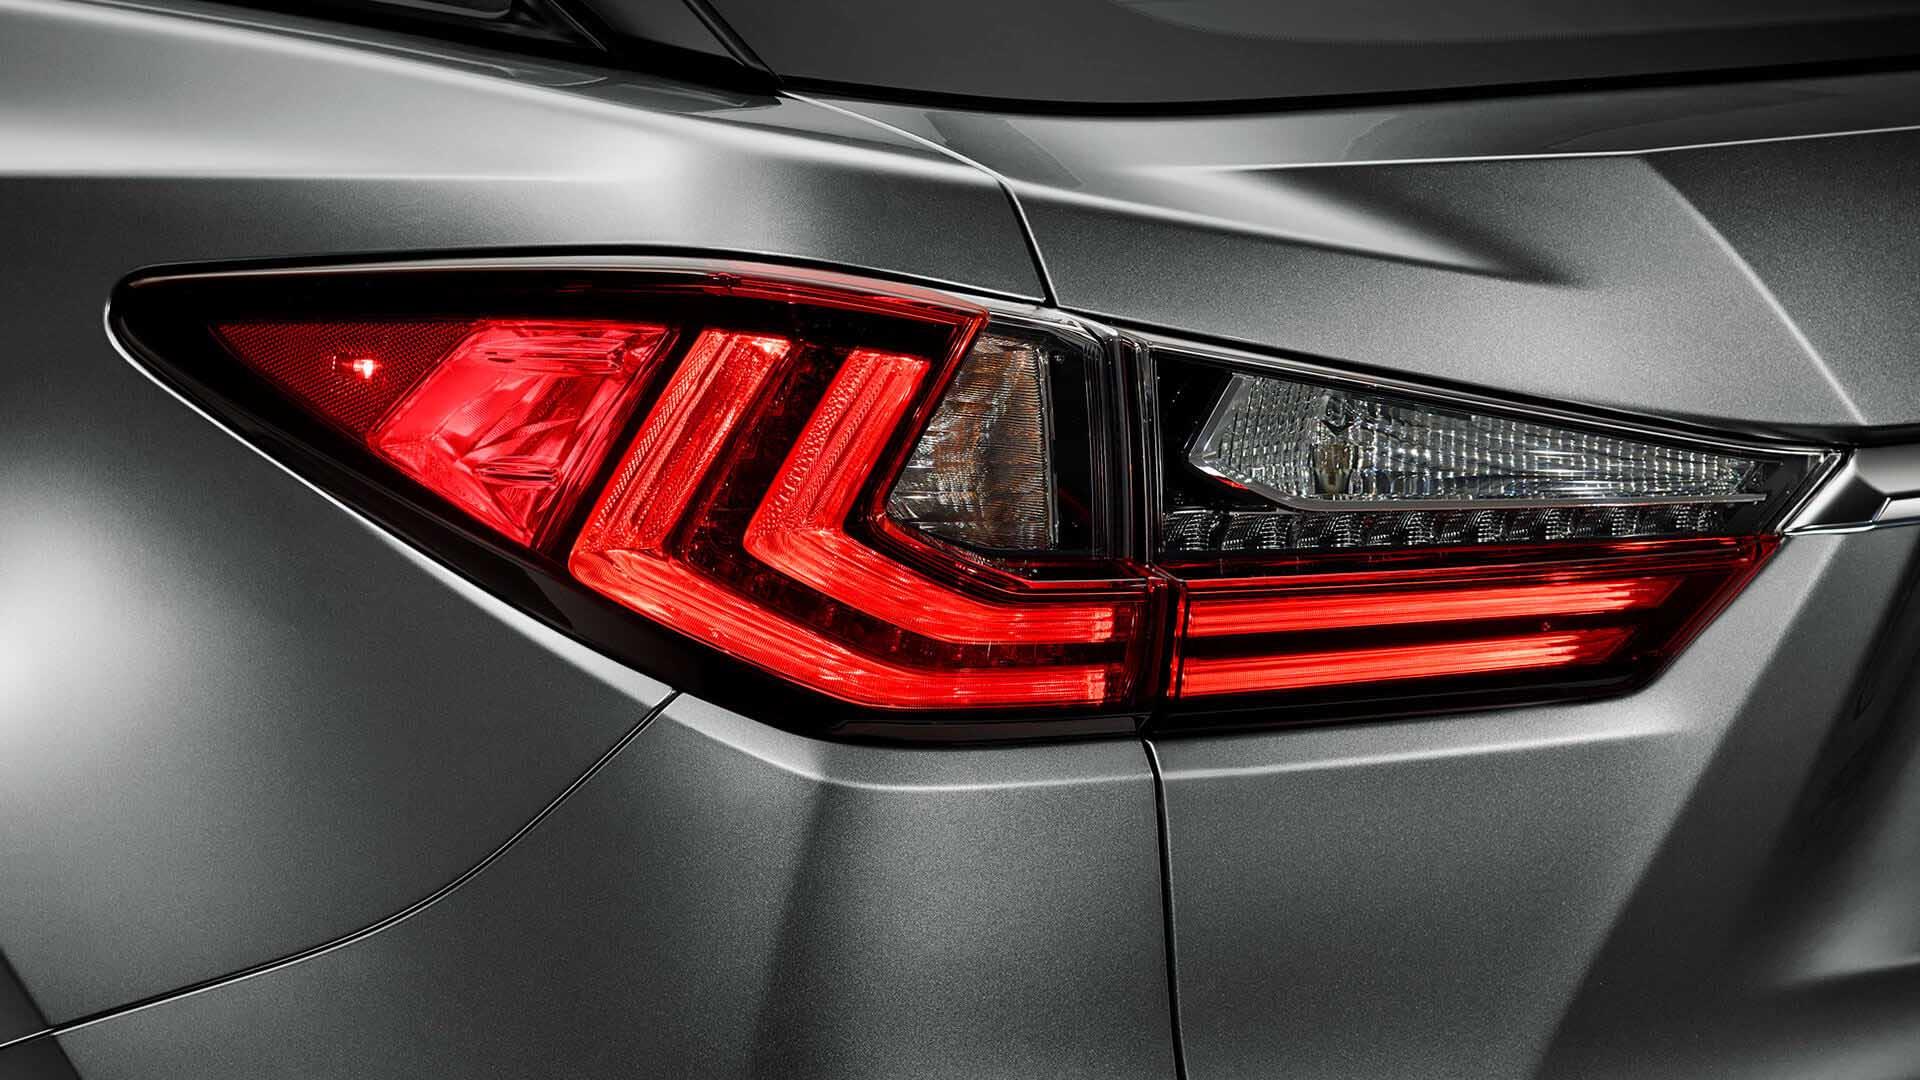 2017 lexus rx 450h features led rear lightd